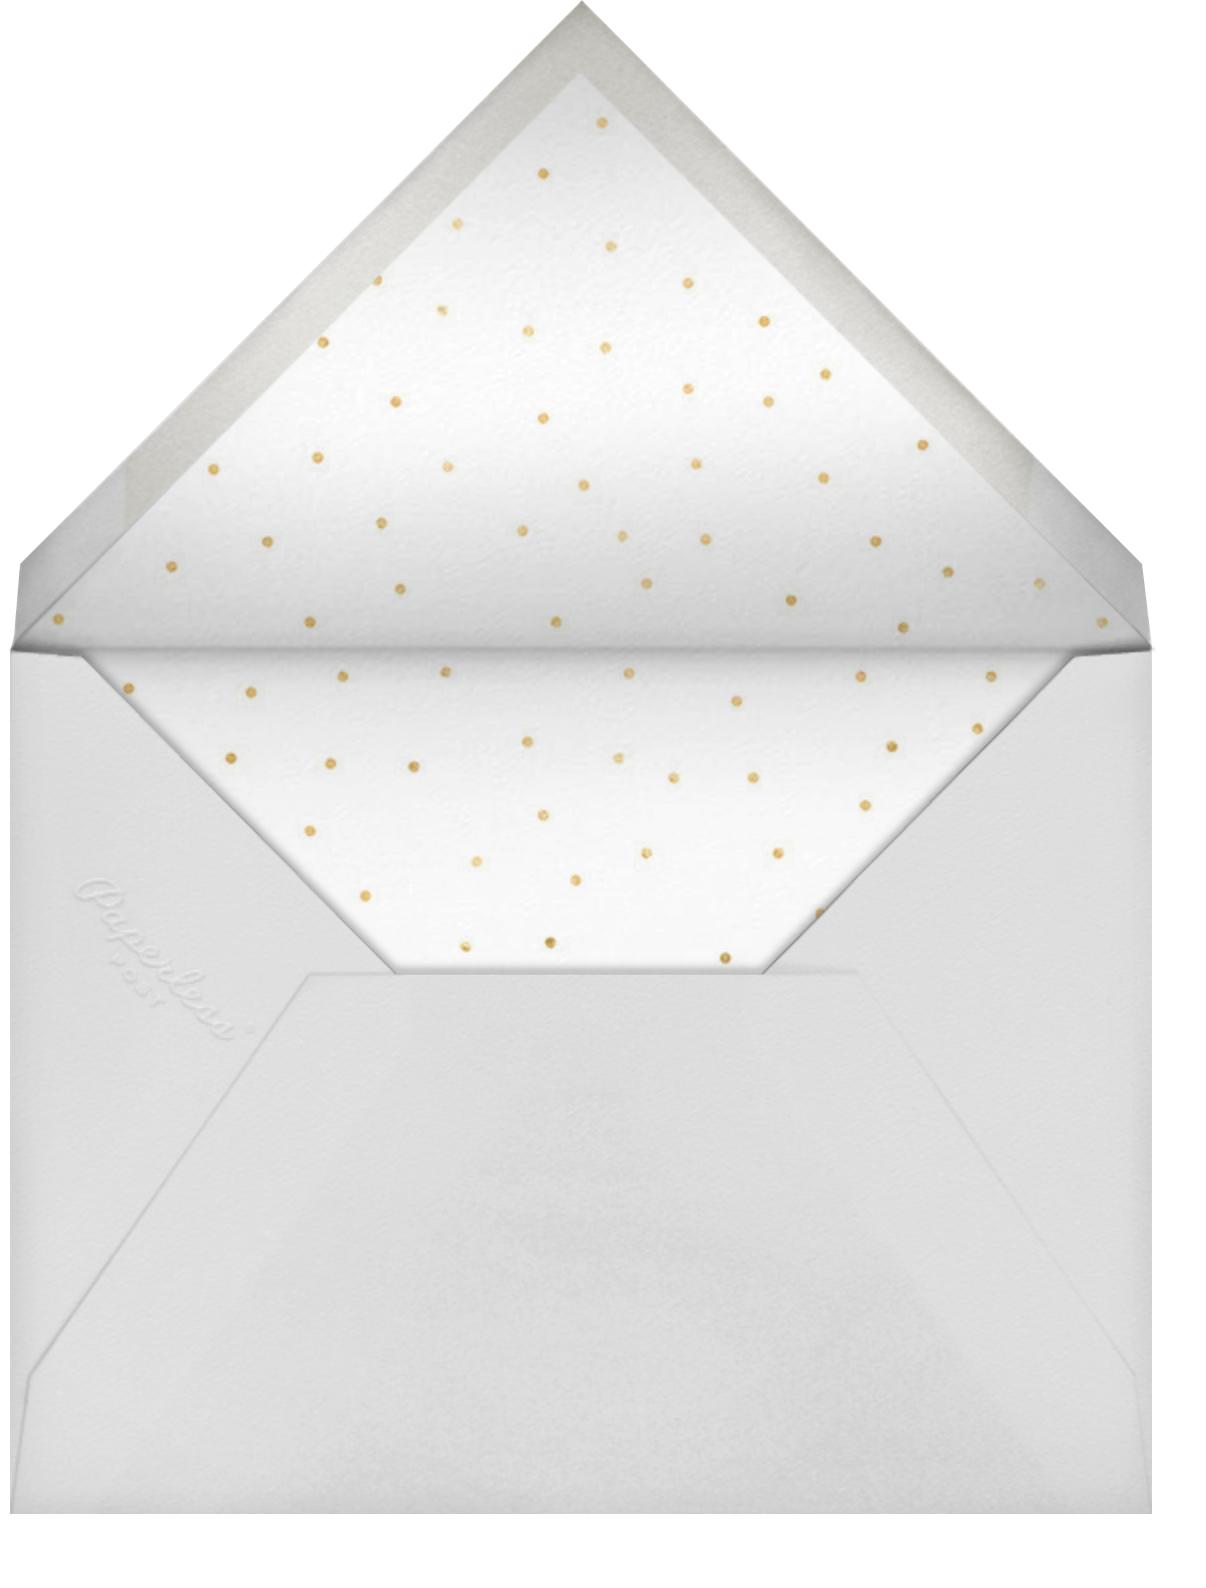 That Petals It - Blossom - kate spade new york - Bridal shower - envelope back